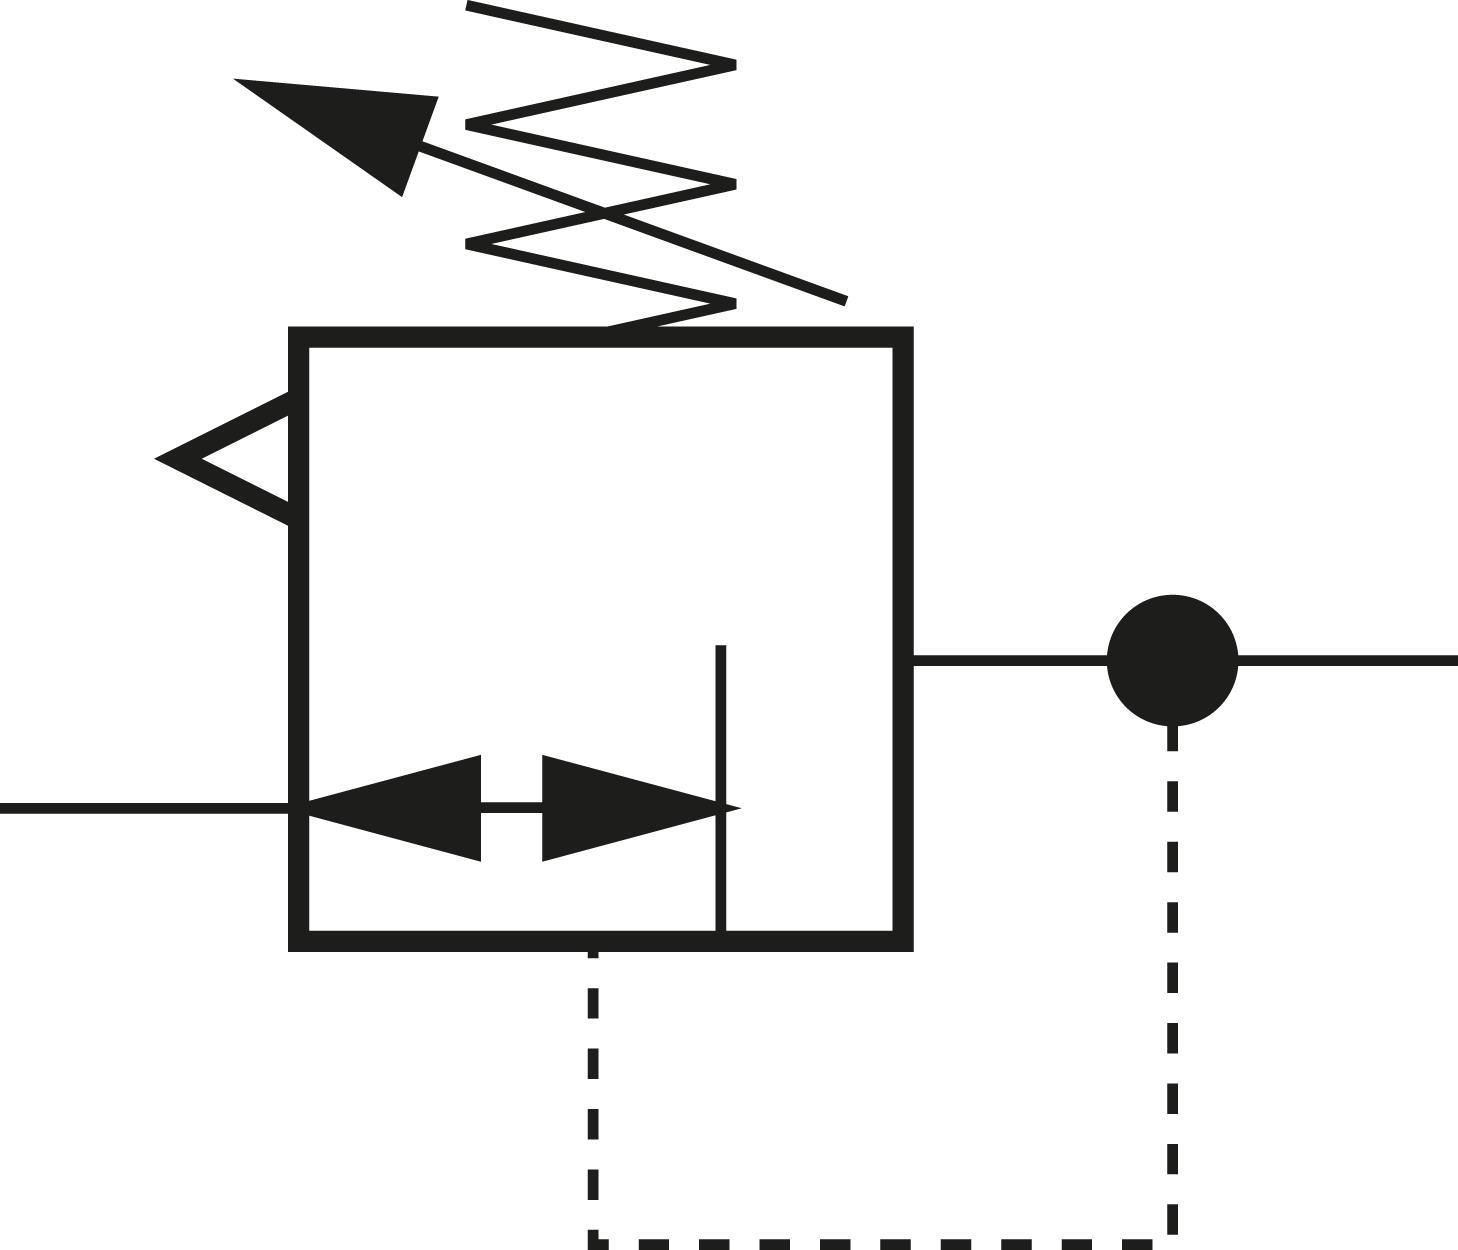 Pressure regulators & precision pressure regulators - Futura ... on p&id symbol for regulator, piping symbol for regulator, drawings symbol for regulator,